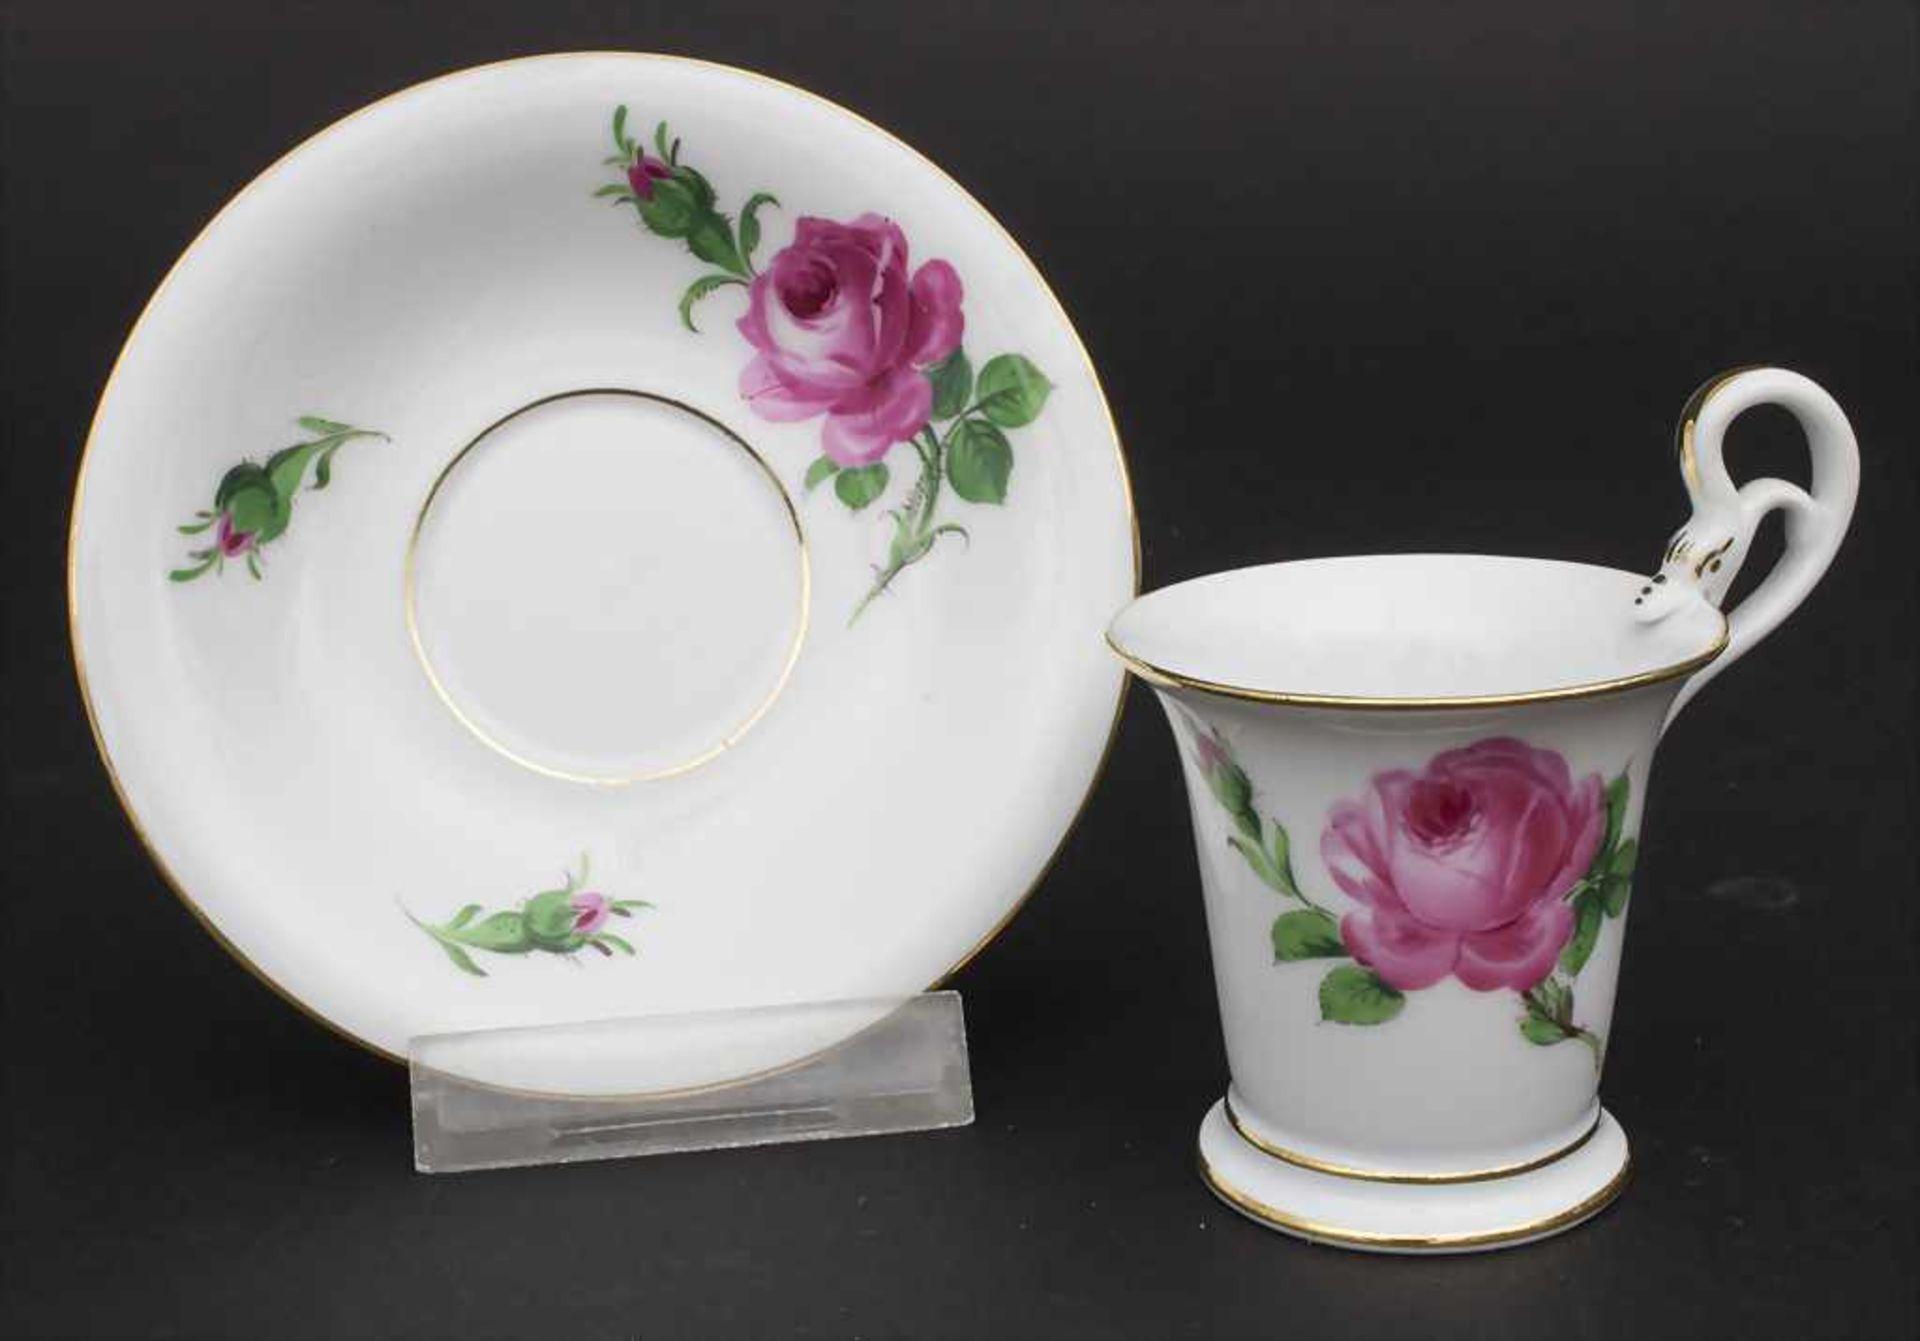 Konvolut Porzellane mit Rosendekor / A set of porcelain with roses, Meissen, 20. Jh. - Bild 8 aus 13